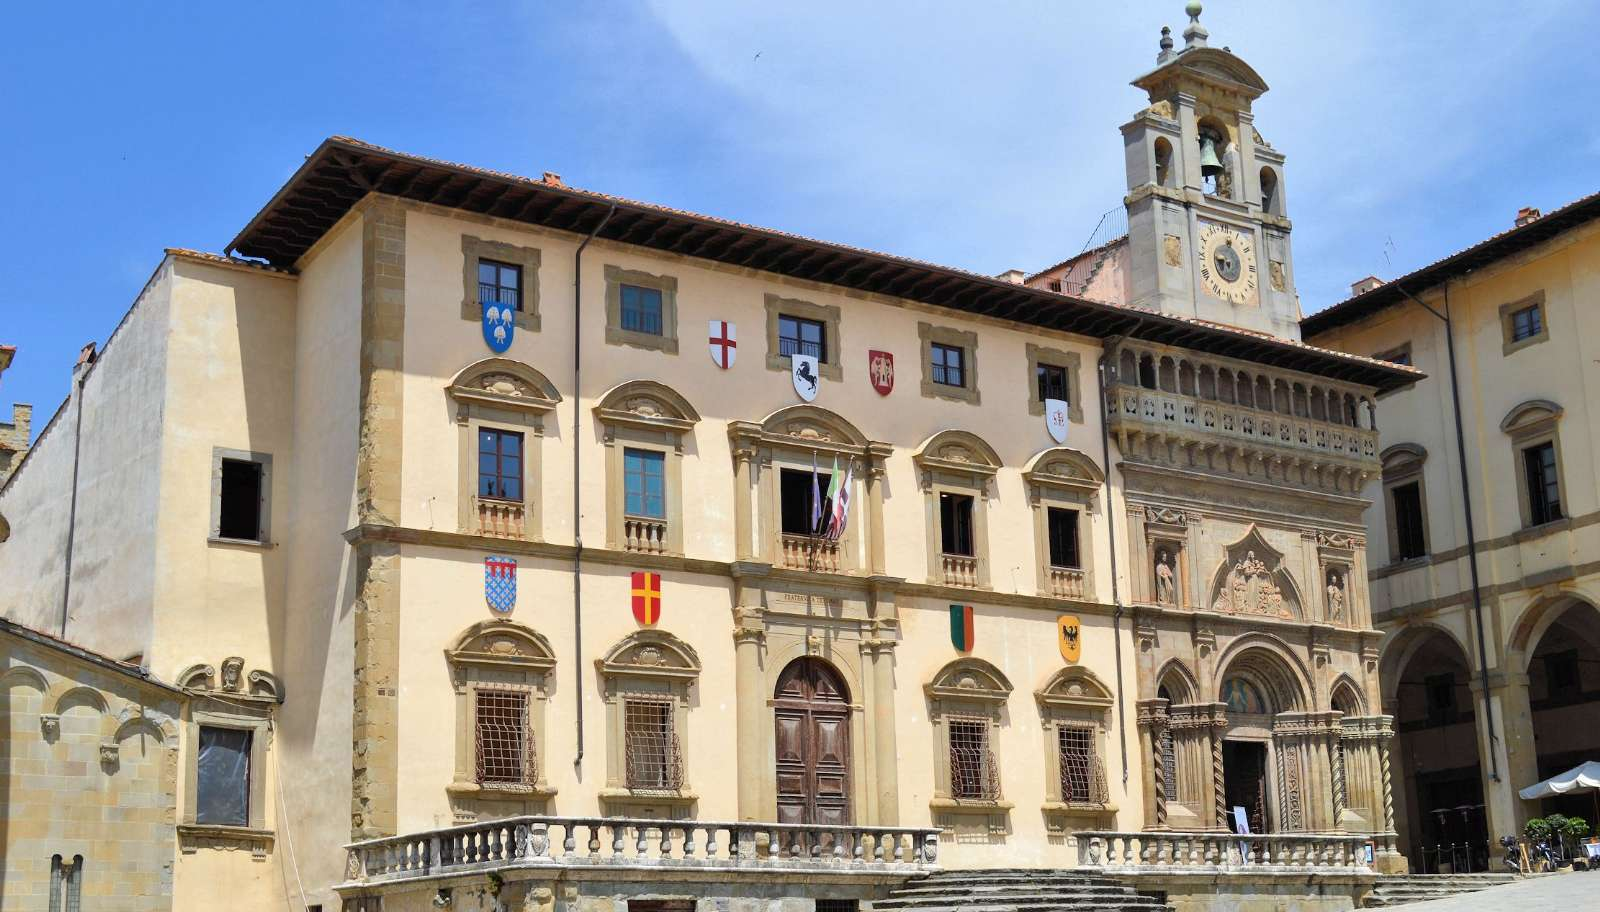 Vackert palats i Arezzo